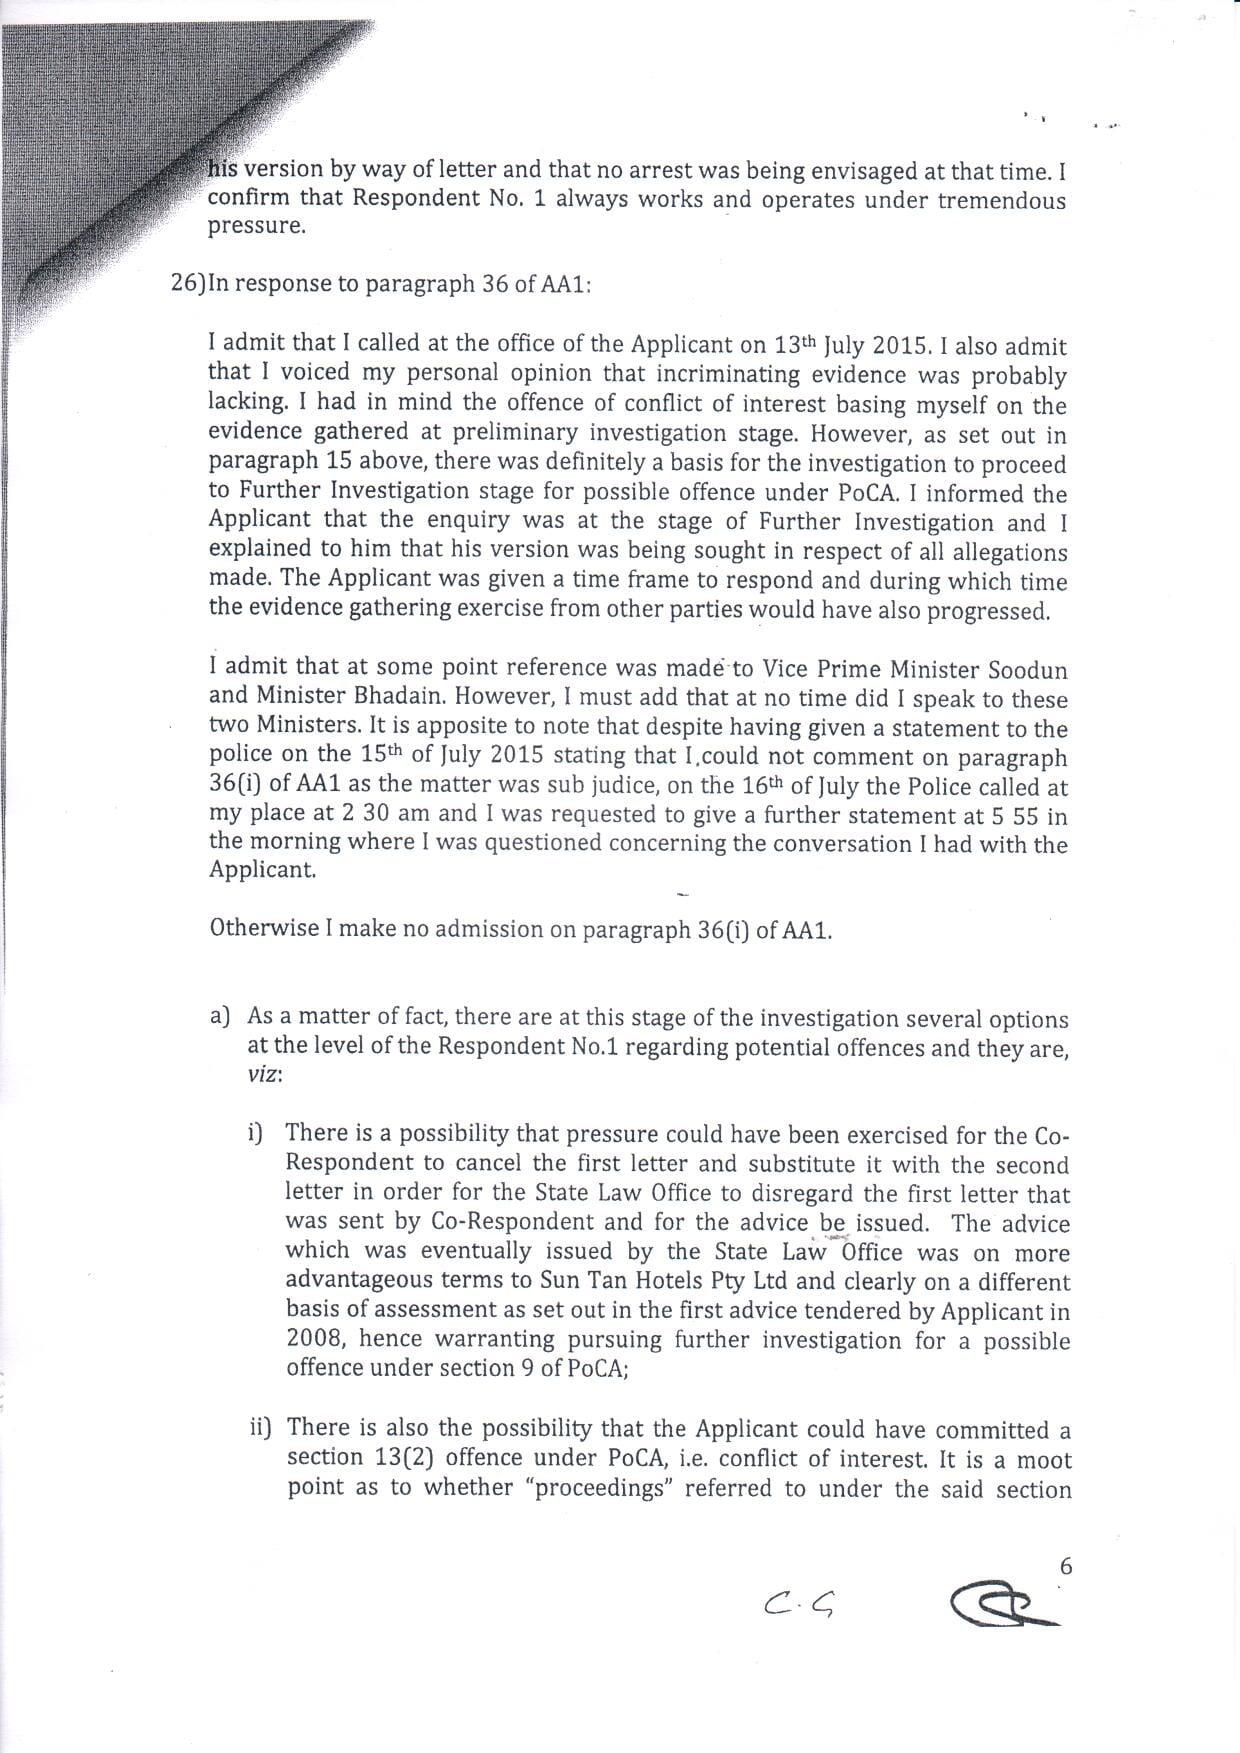 affidavit ICAC boolell 06